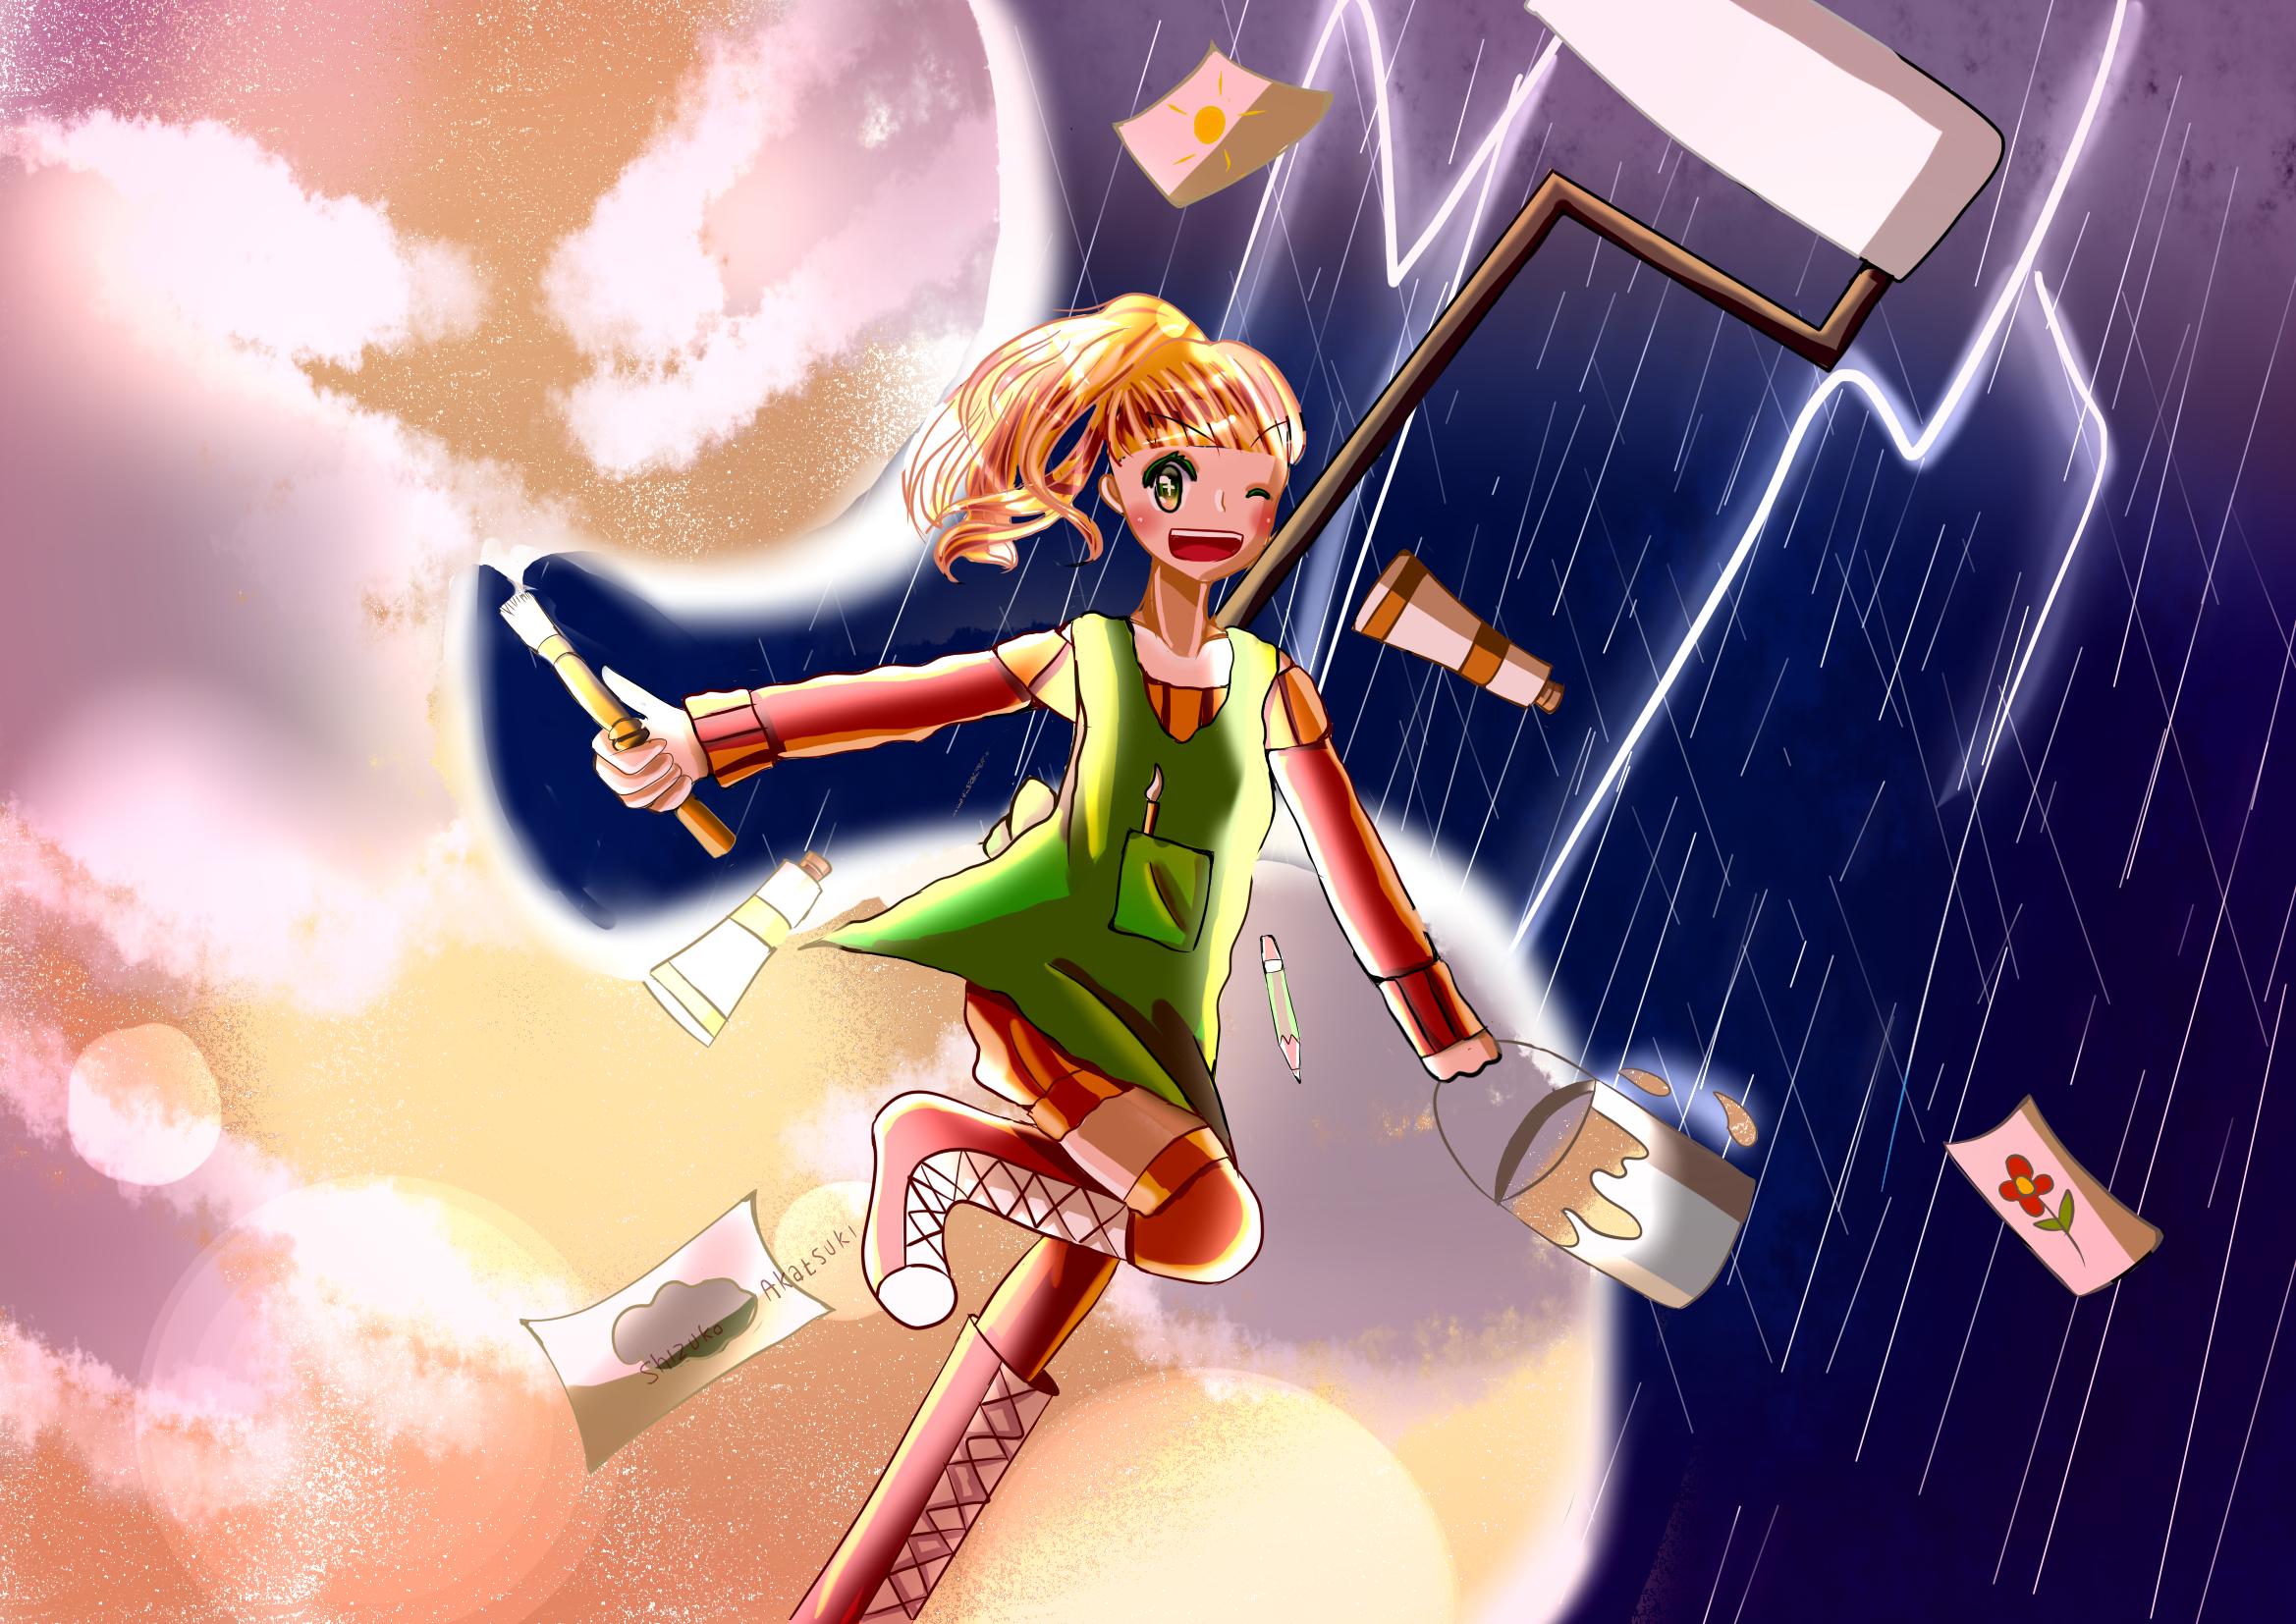 When the Sun Kicks In by Shizuko-Akatsuki